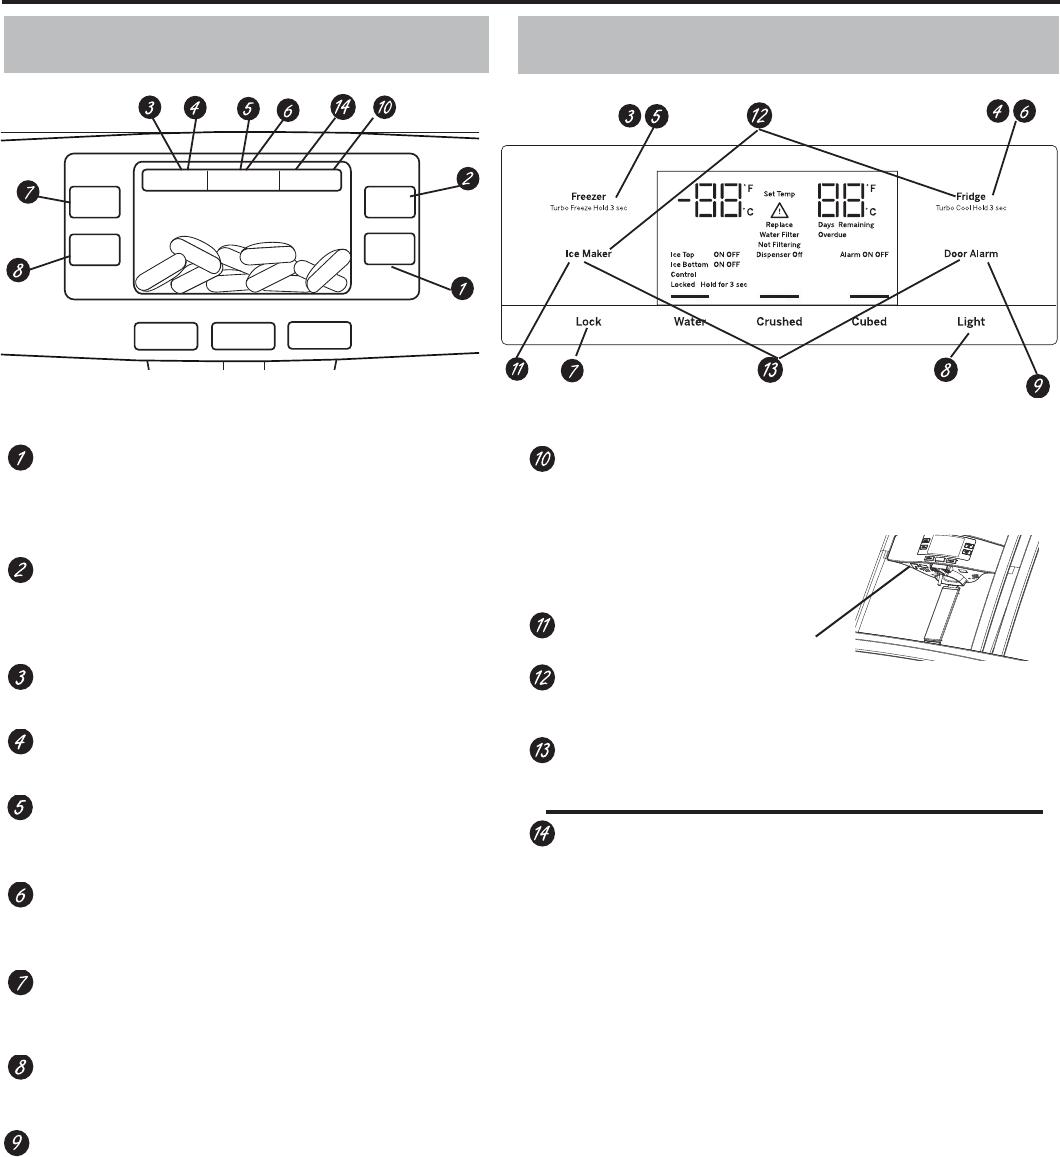 Ge Gne29gmkes User Manual To The 7e676178 D06c 4ef7 86c1 Fd1bdfbd7384 Fridge Door Alarm Circuit Diagram 8